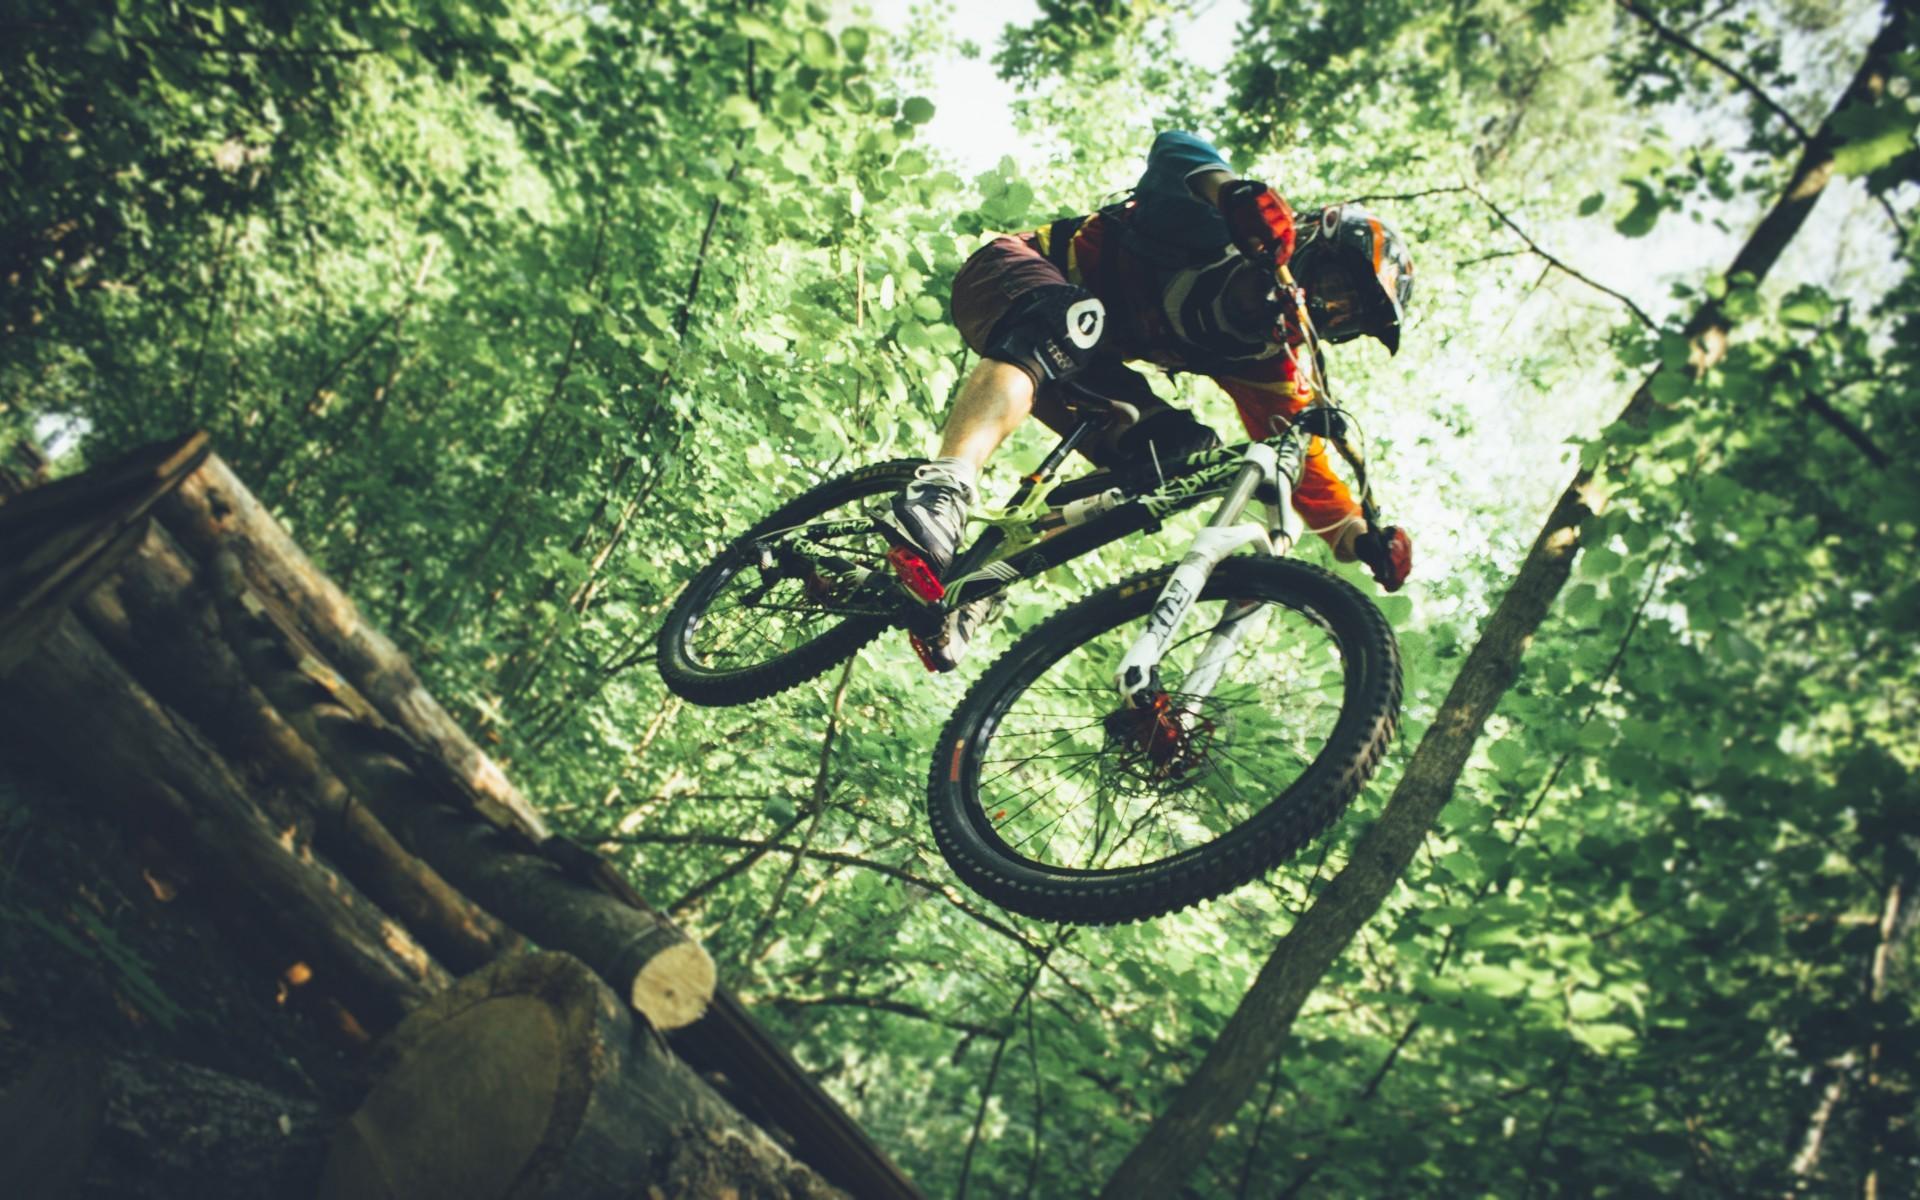 Wallpaper 1920x1200 Px Downhill Mountain Biking Helmet